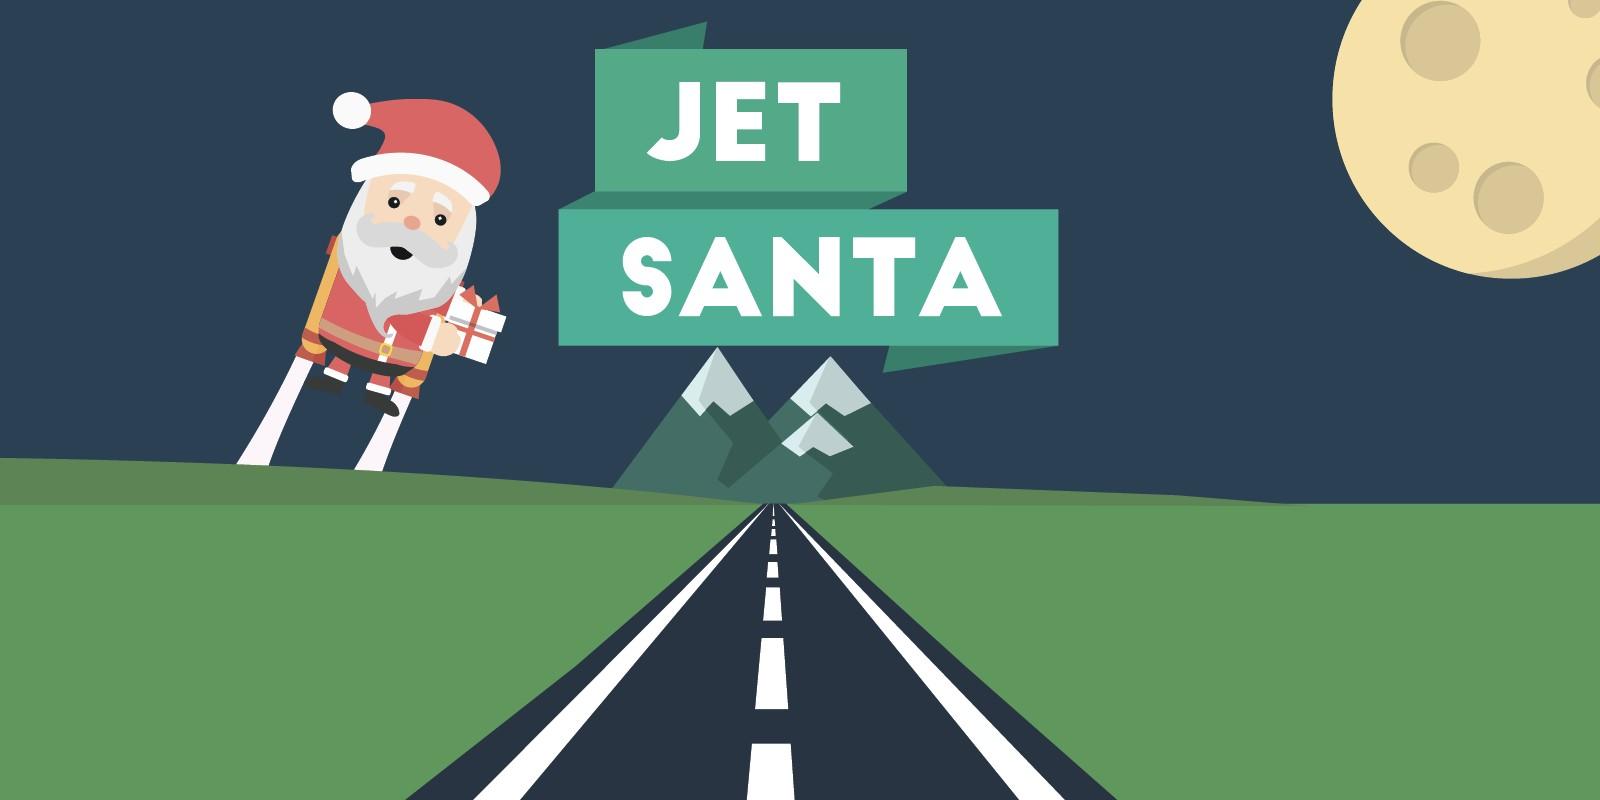 Jet Santa - Unity Game Source Code